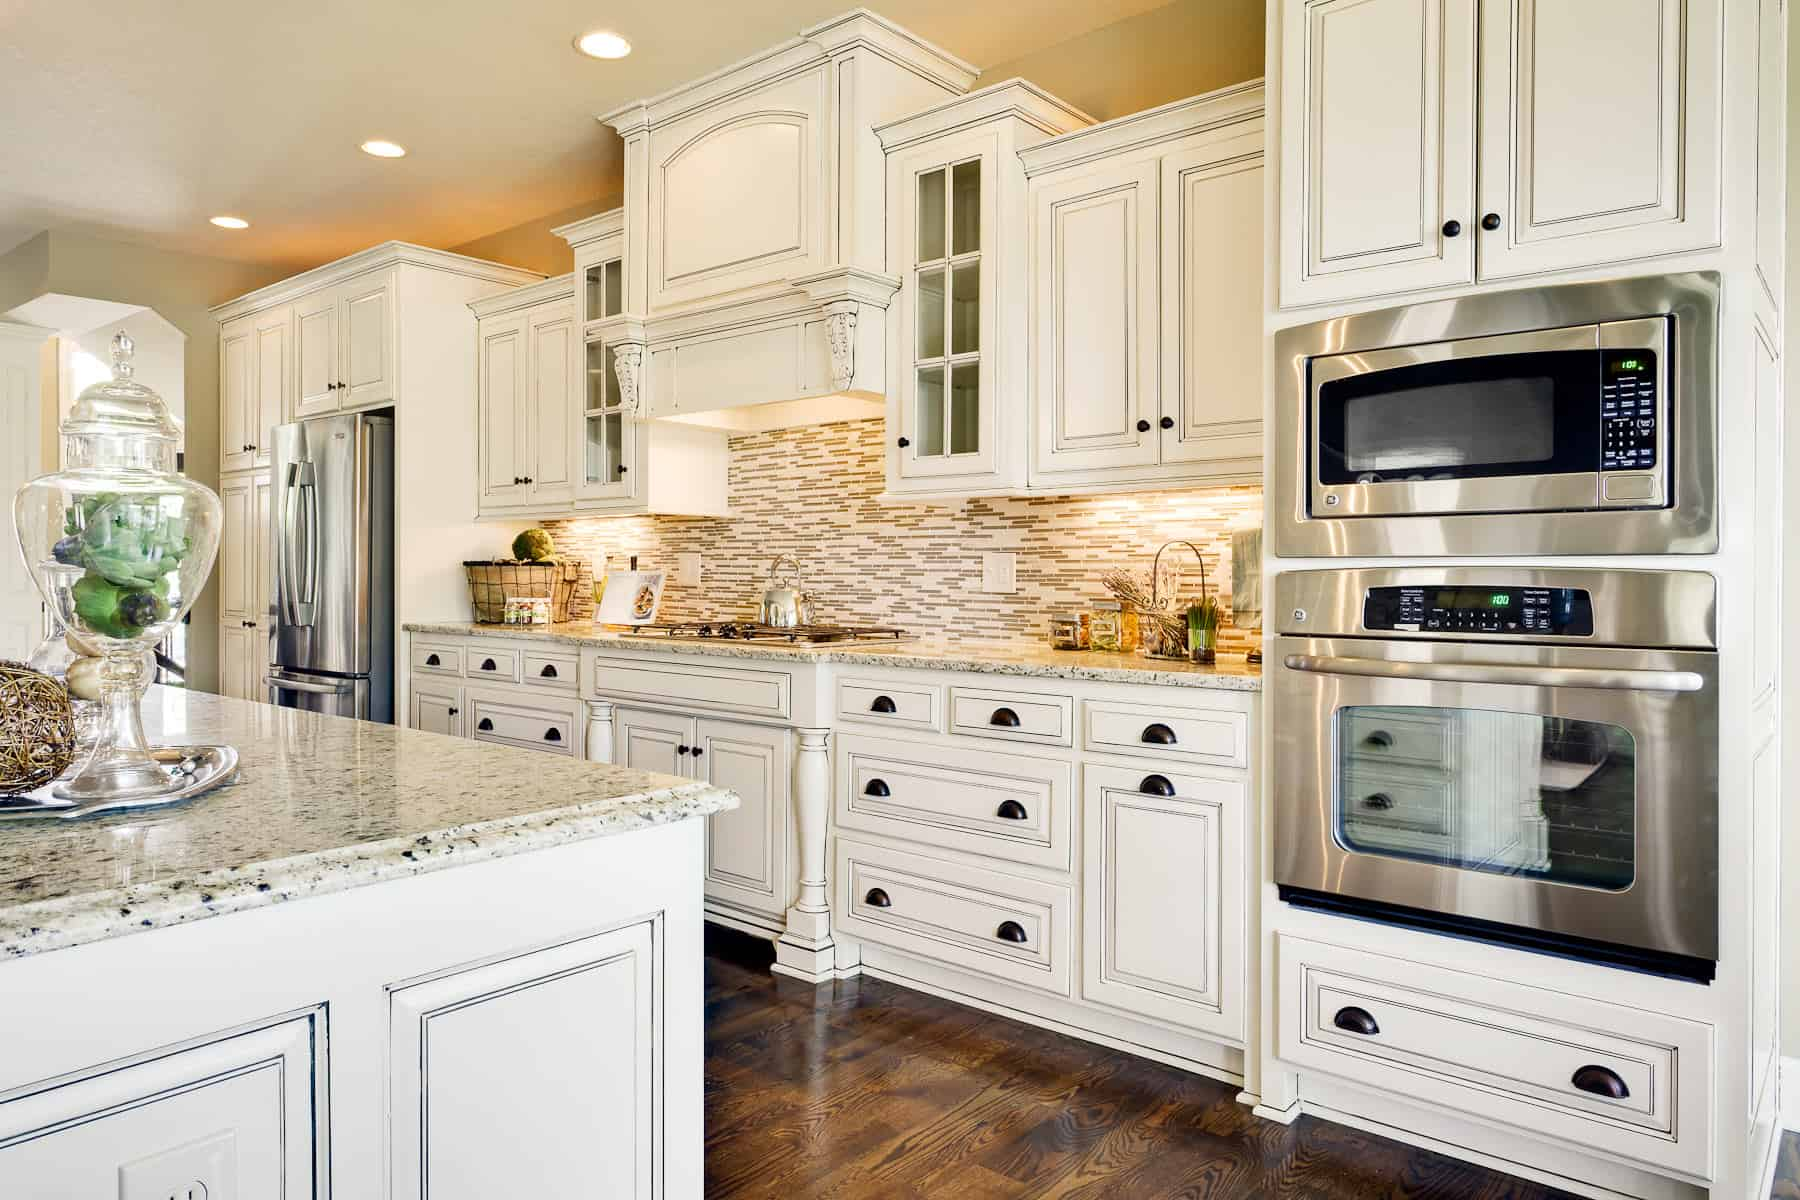 granite countertops cost discount kitchen countertops Granite Countertops Cost Factors